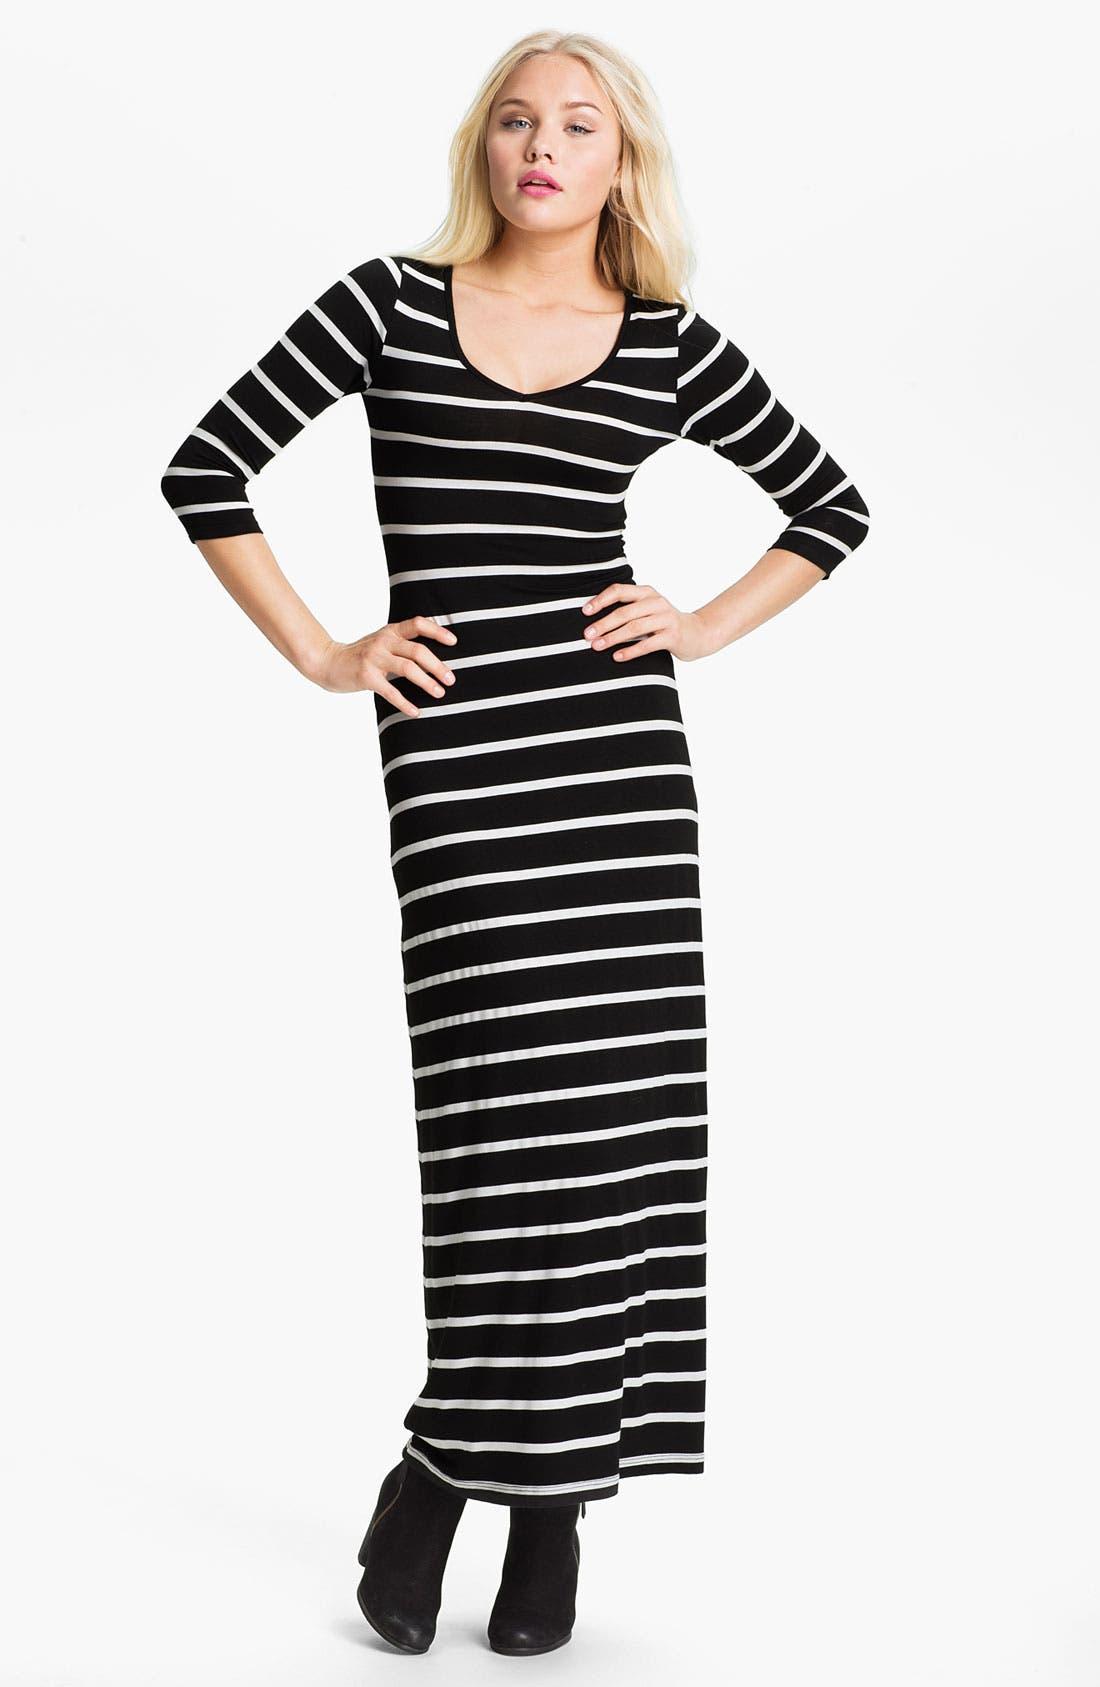 Alternate Image 1 Selected - Soprano Stripe Maxi Dress (Juniors)